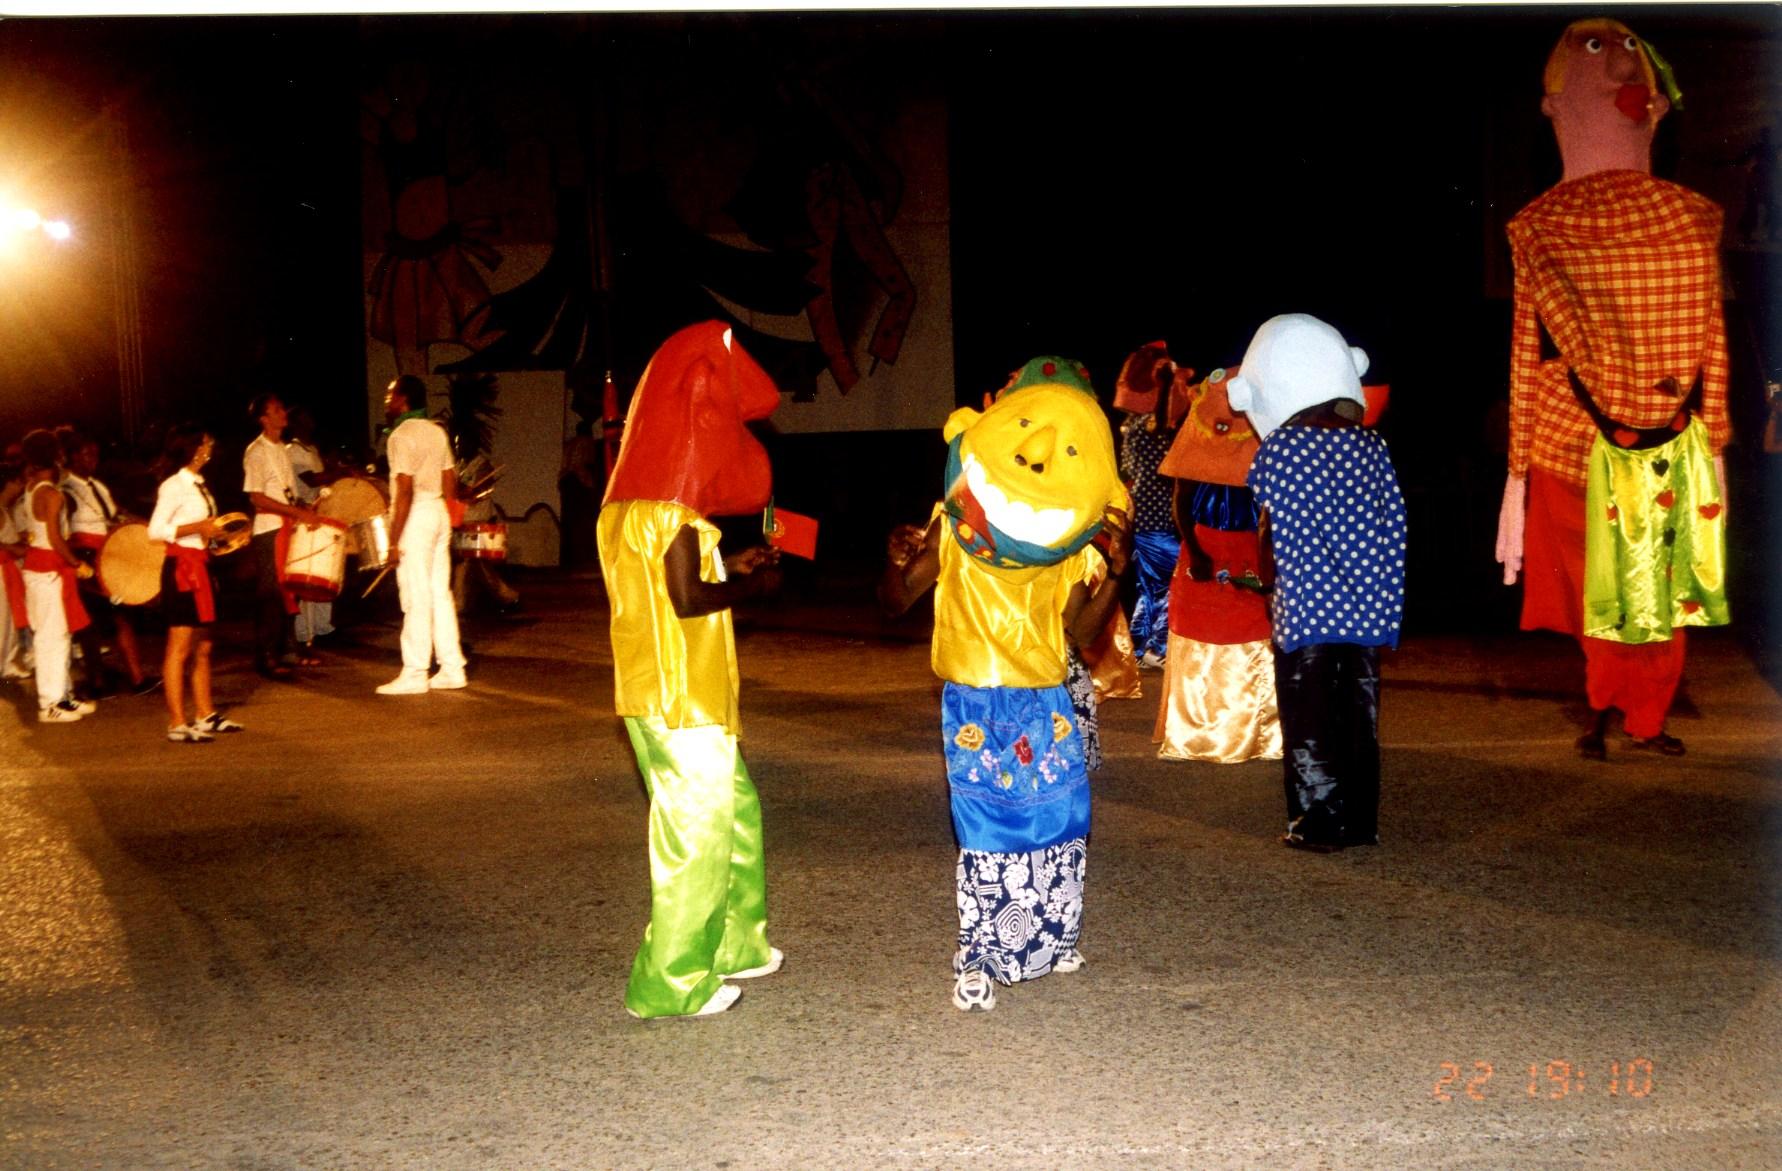 Carnaval 2003-2004